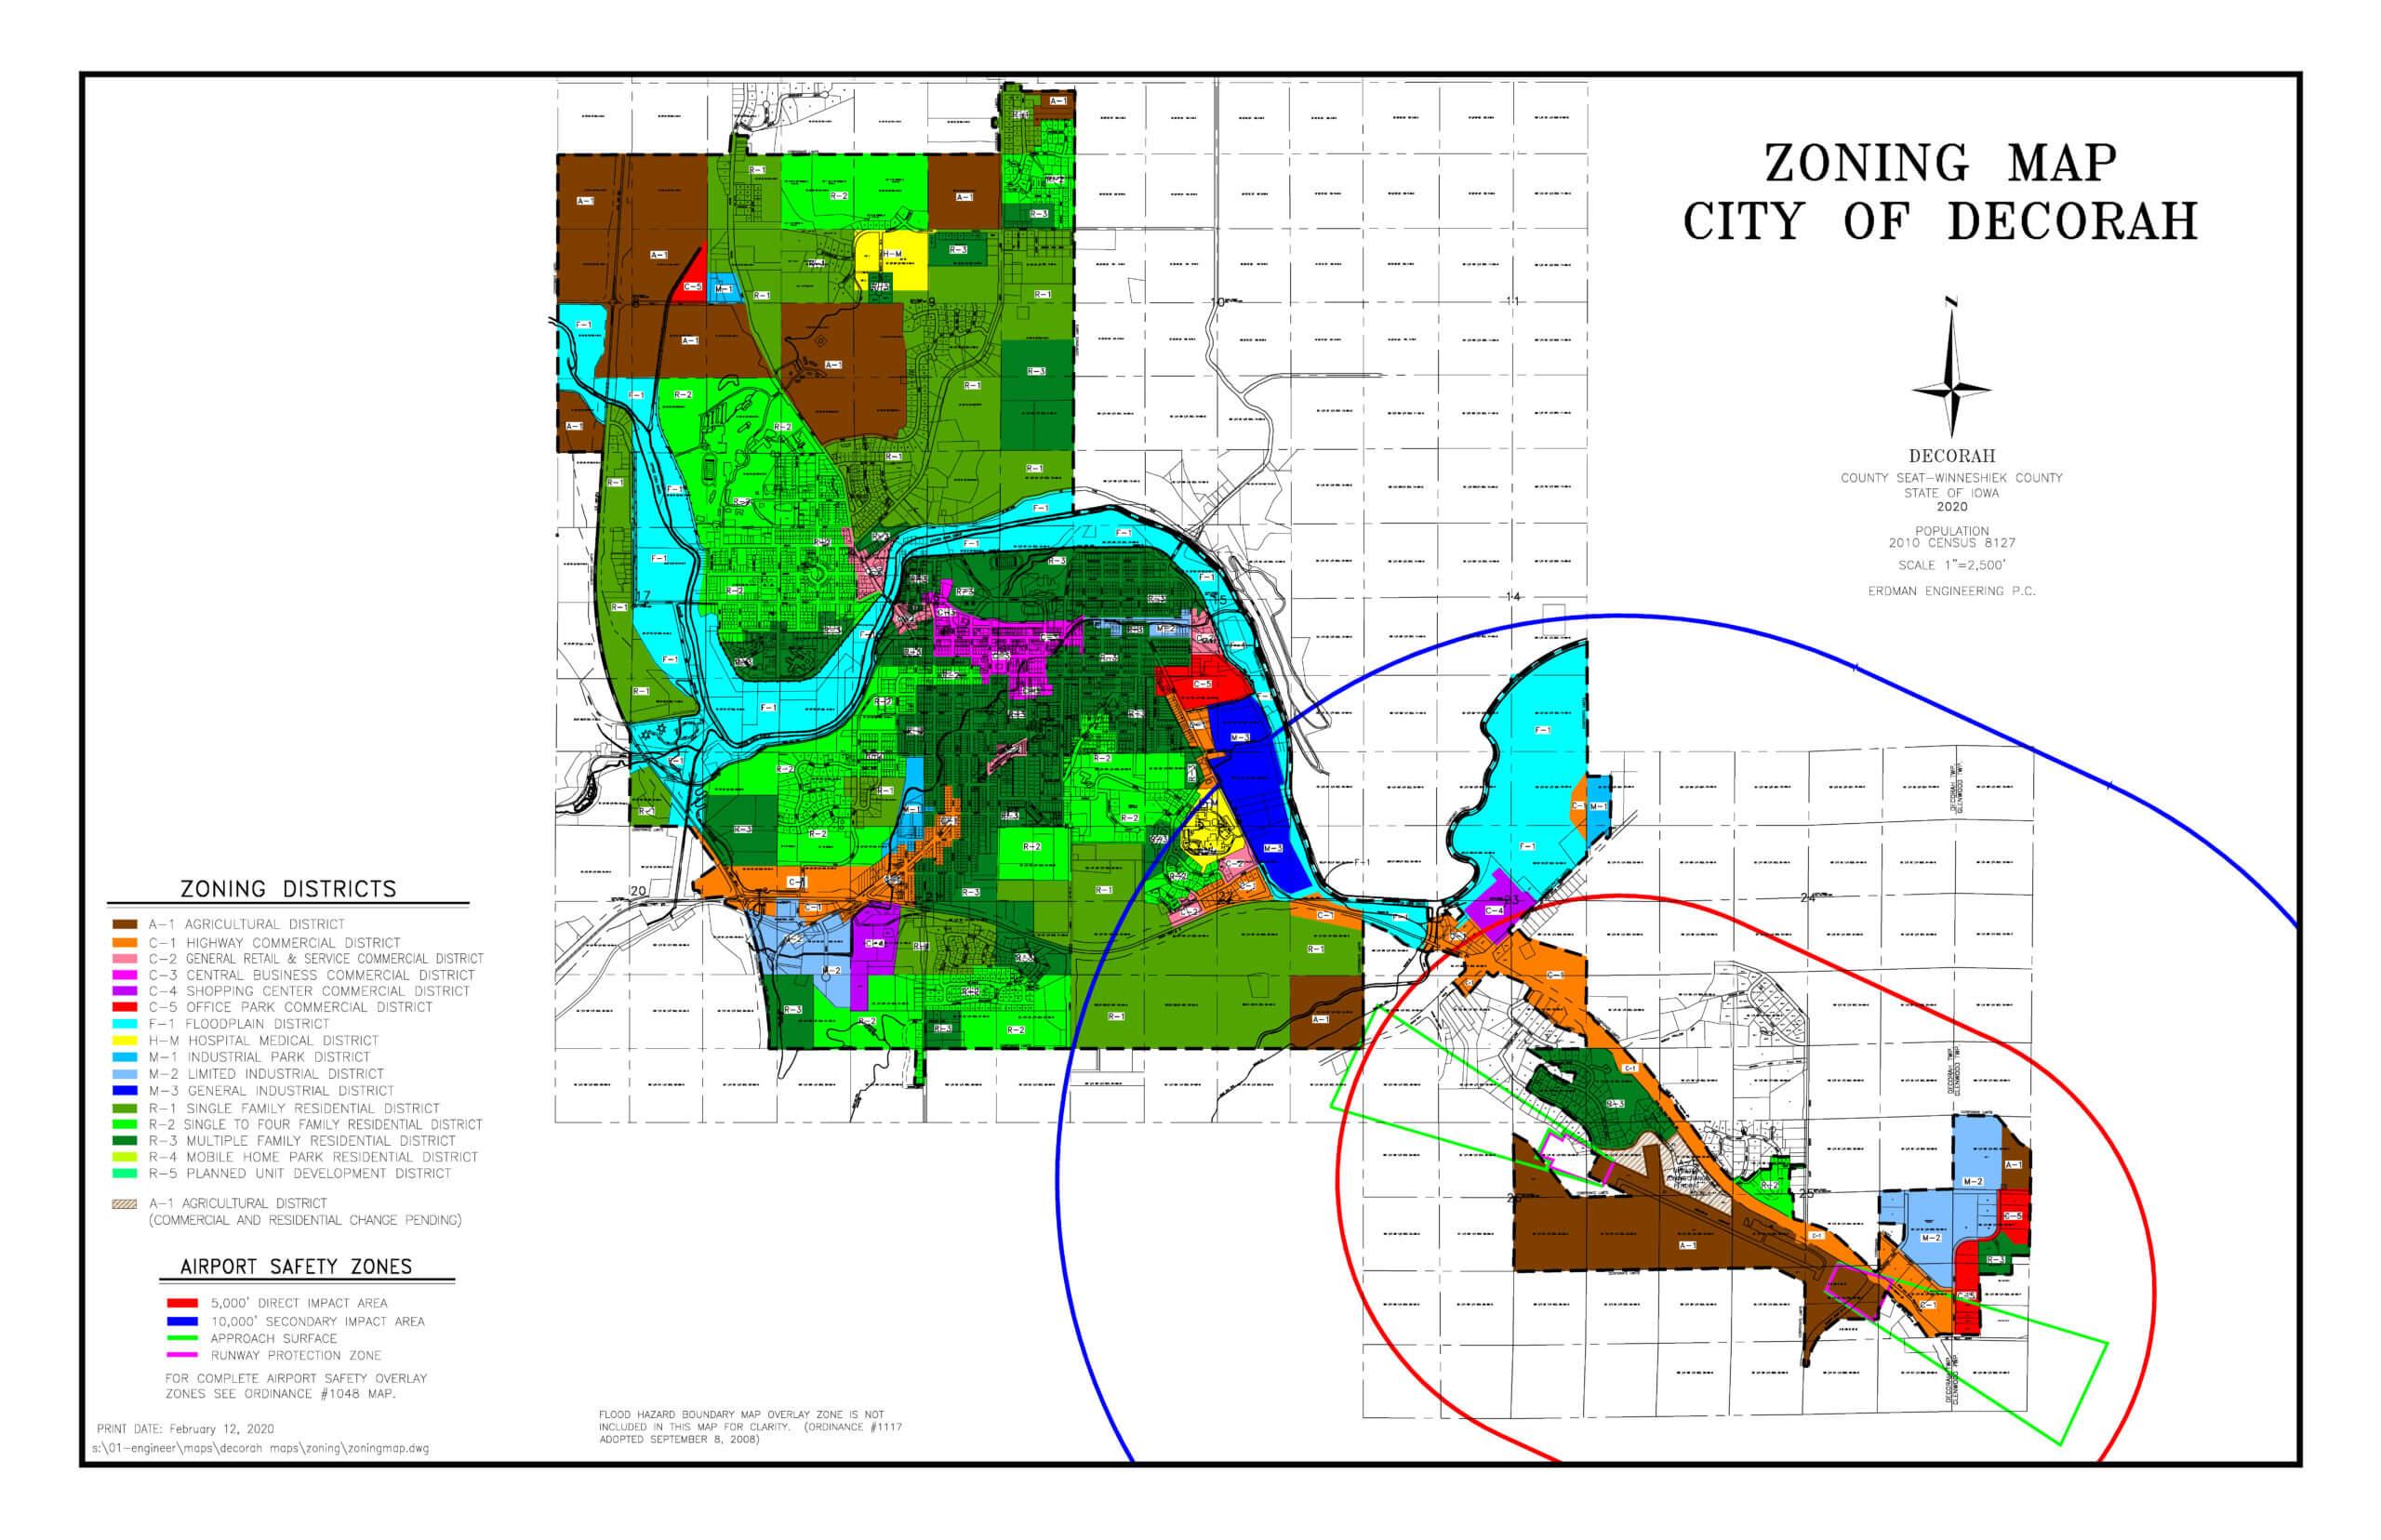 map of decorah iowa Decorah Zoning Map City Of Decorah Iowa map of decorah iowa